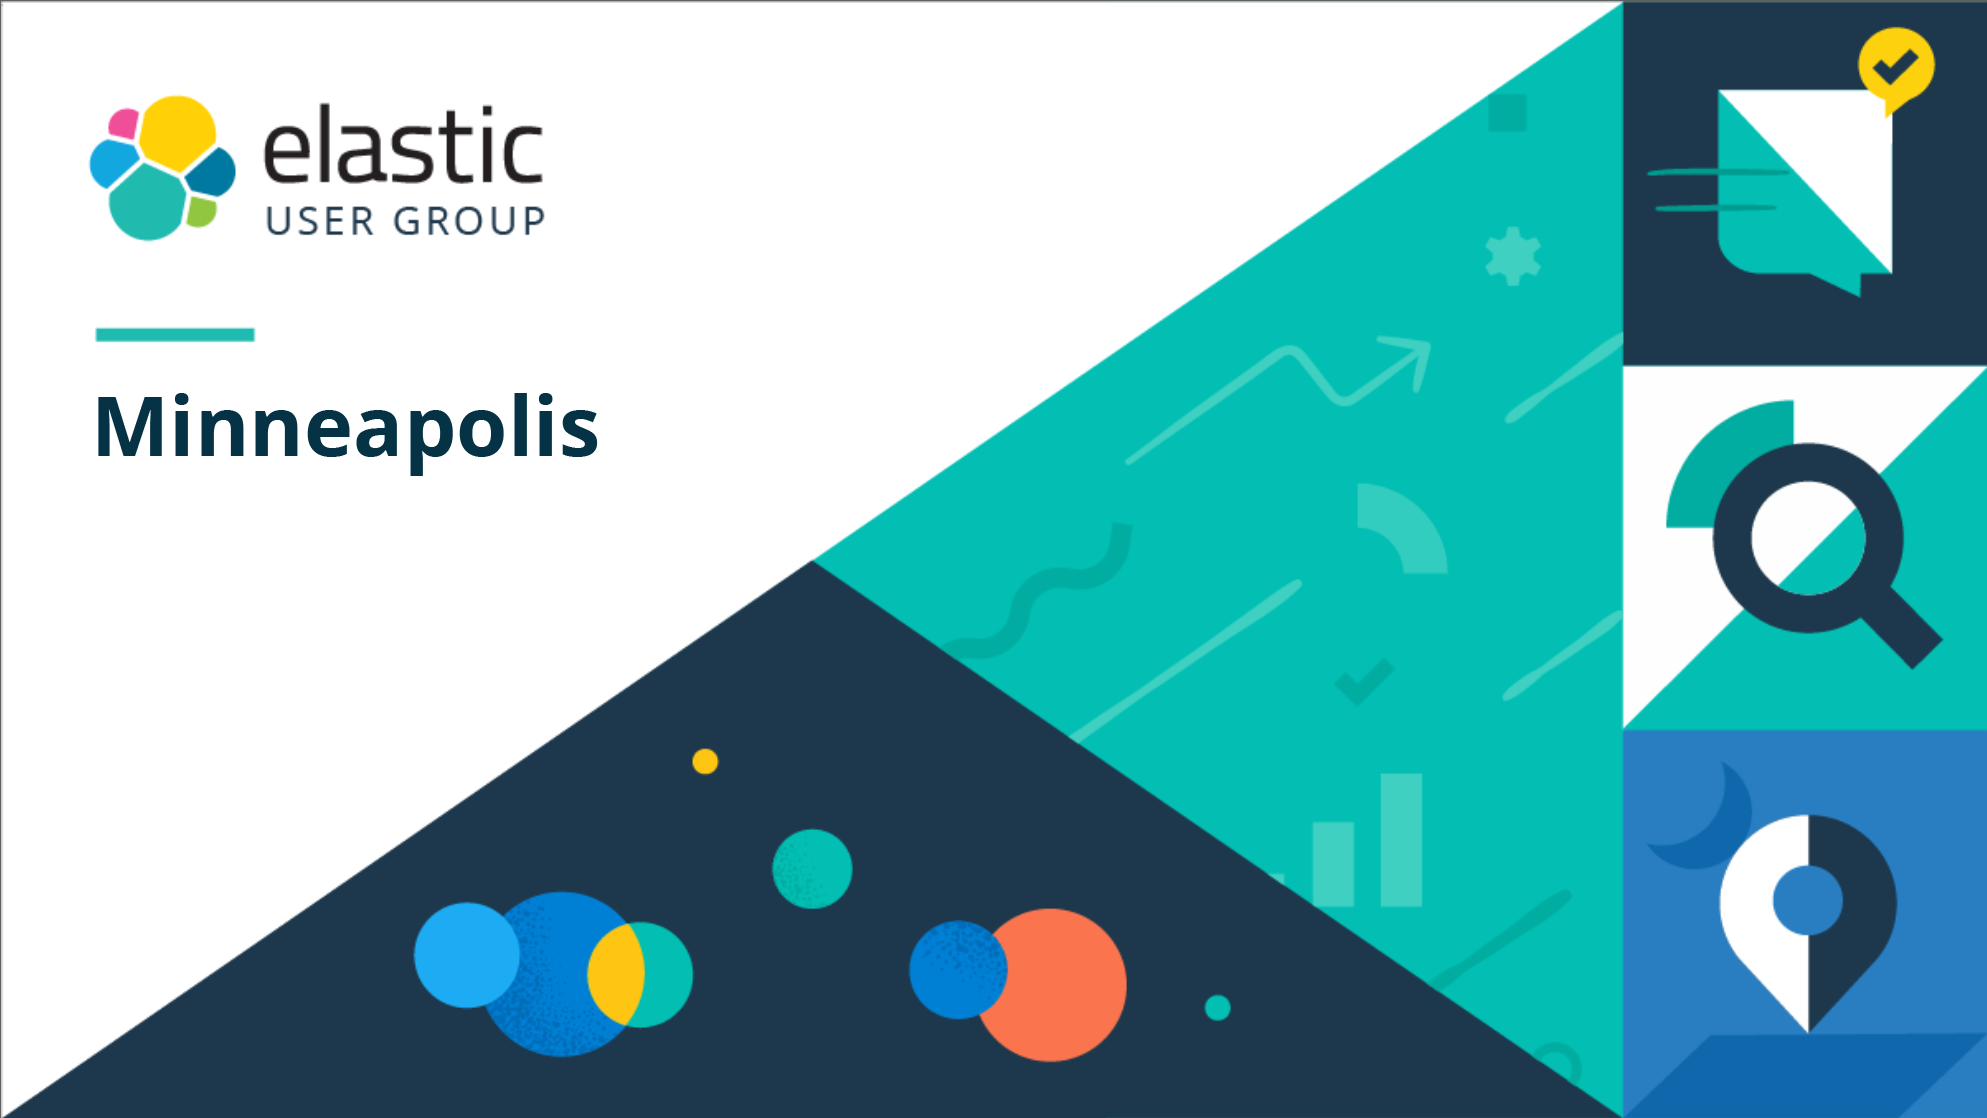 Elastic Minneapolis User Group